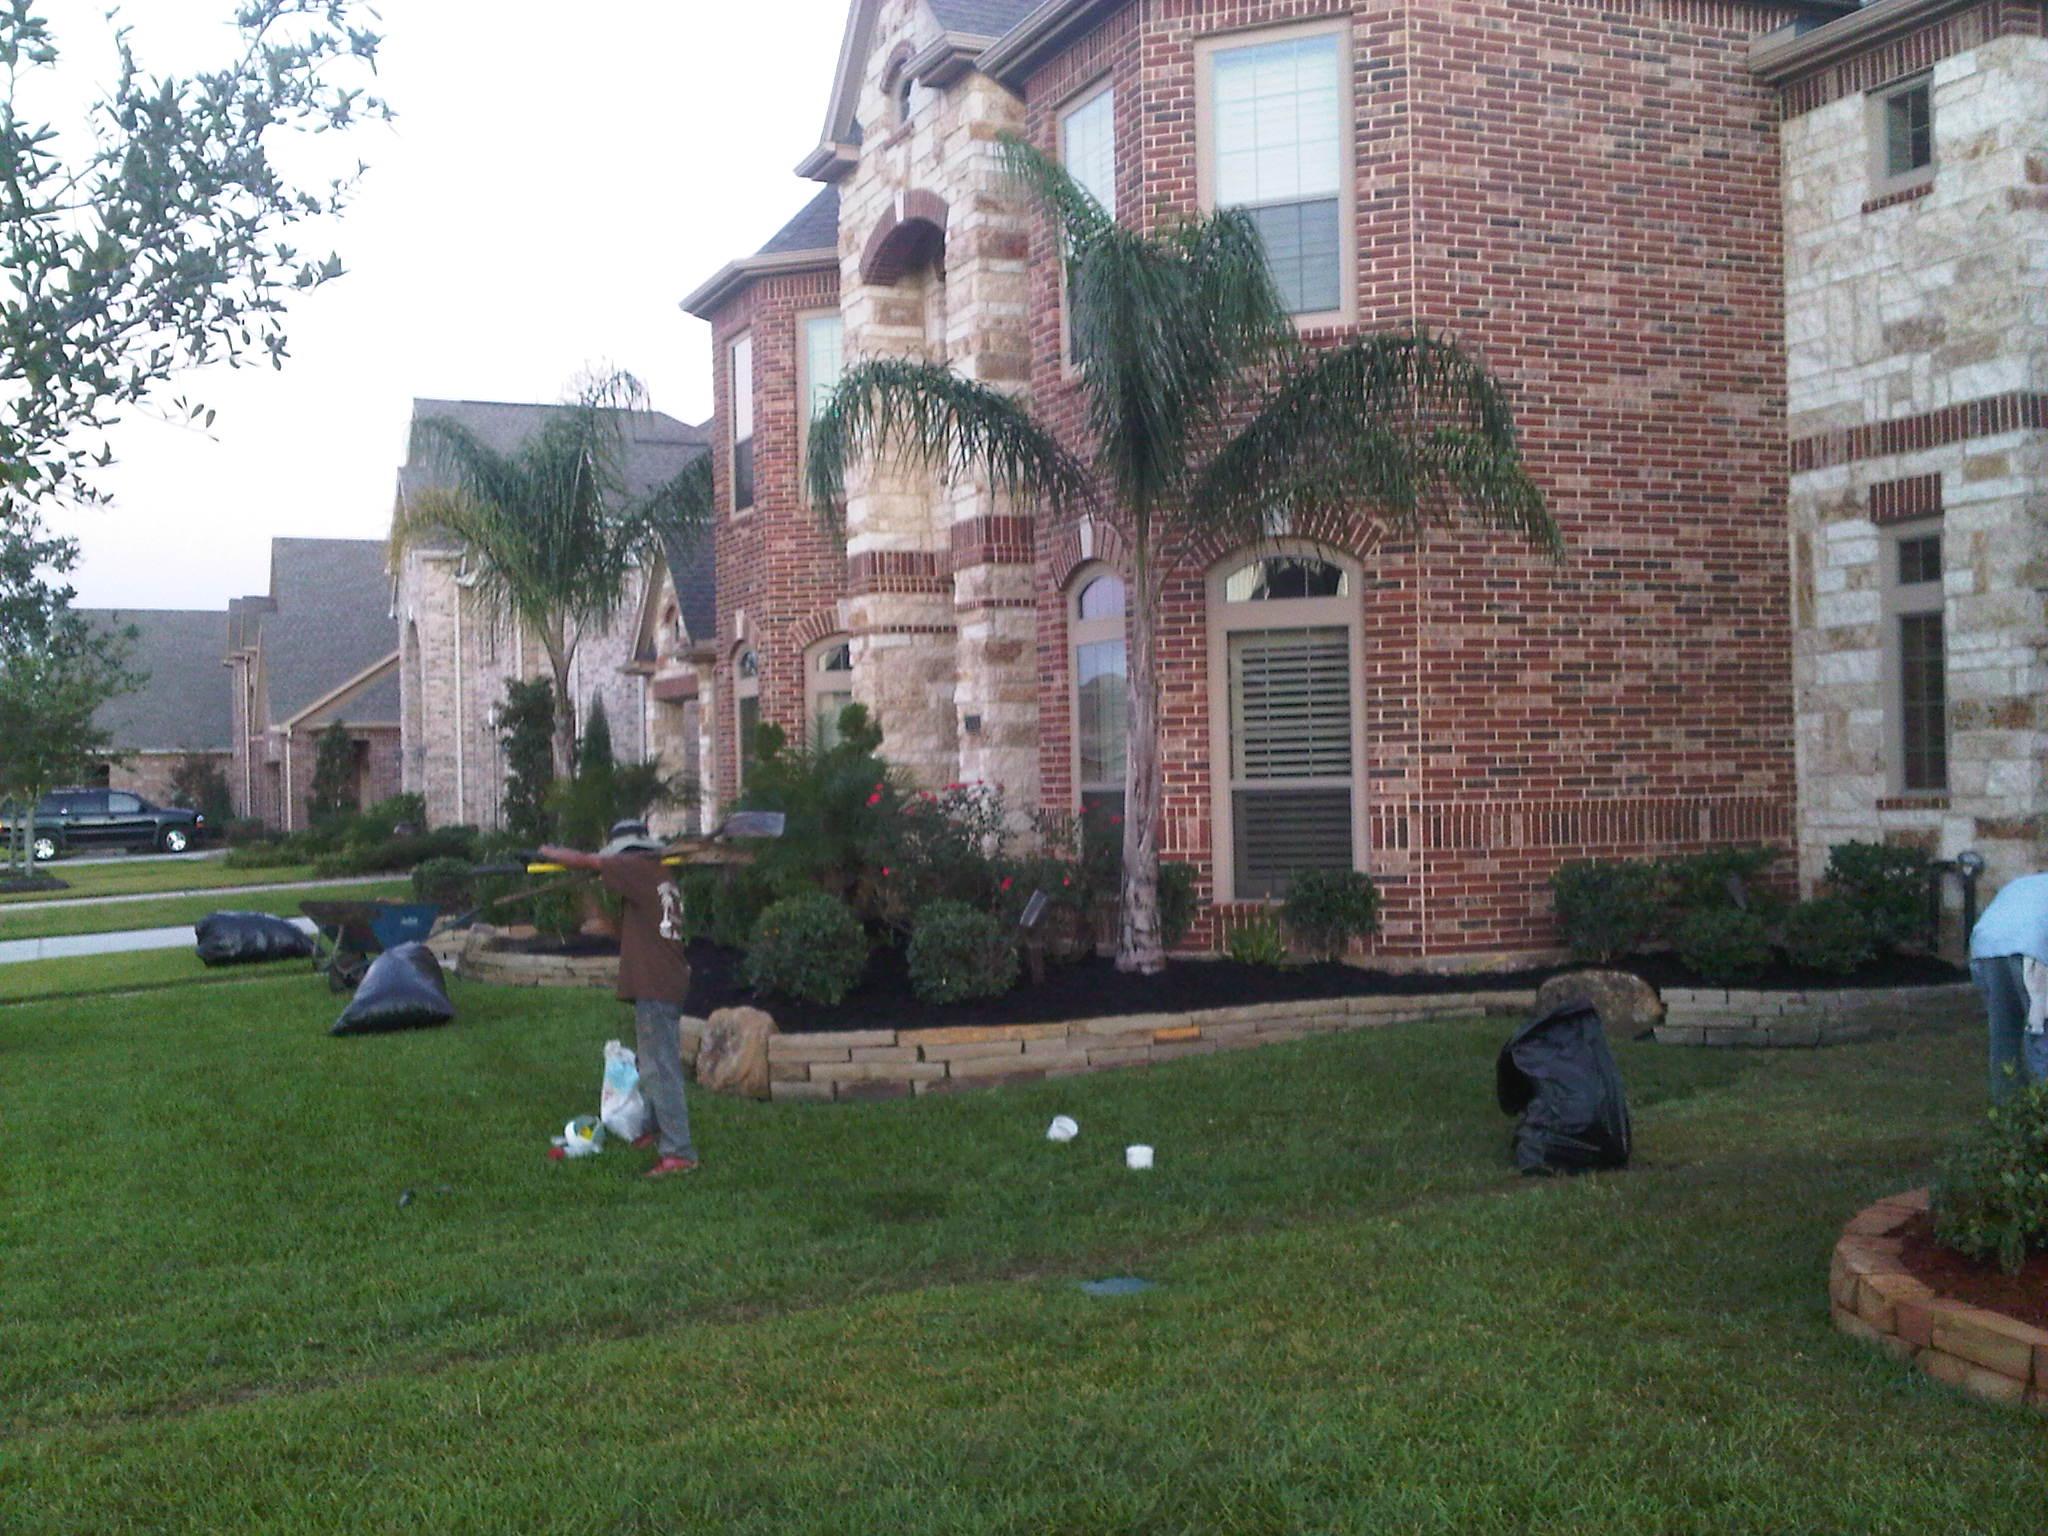 Texas Lawn Care Katy Tx Fb Cffbecb